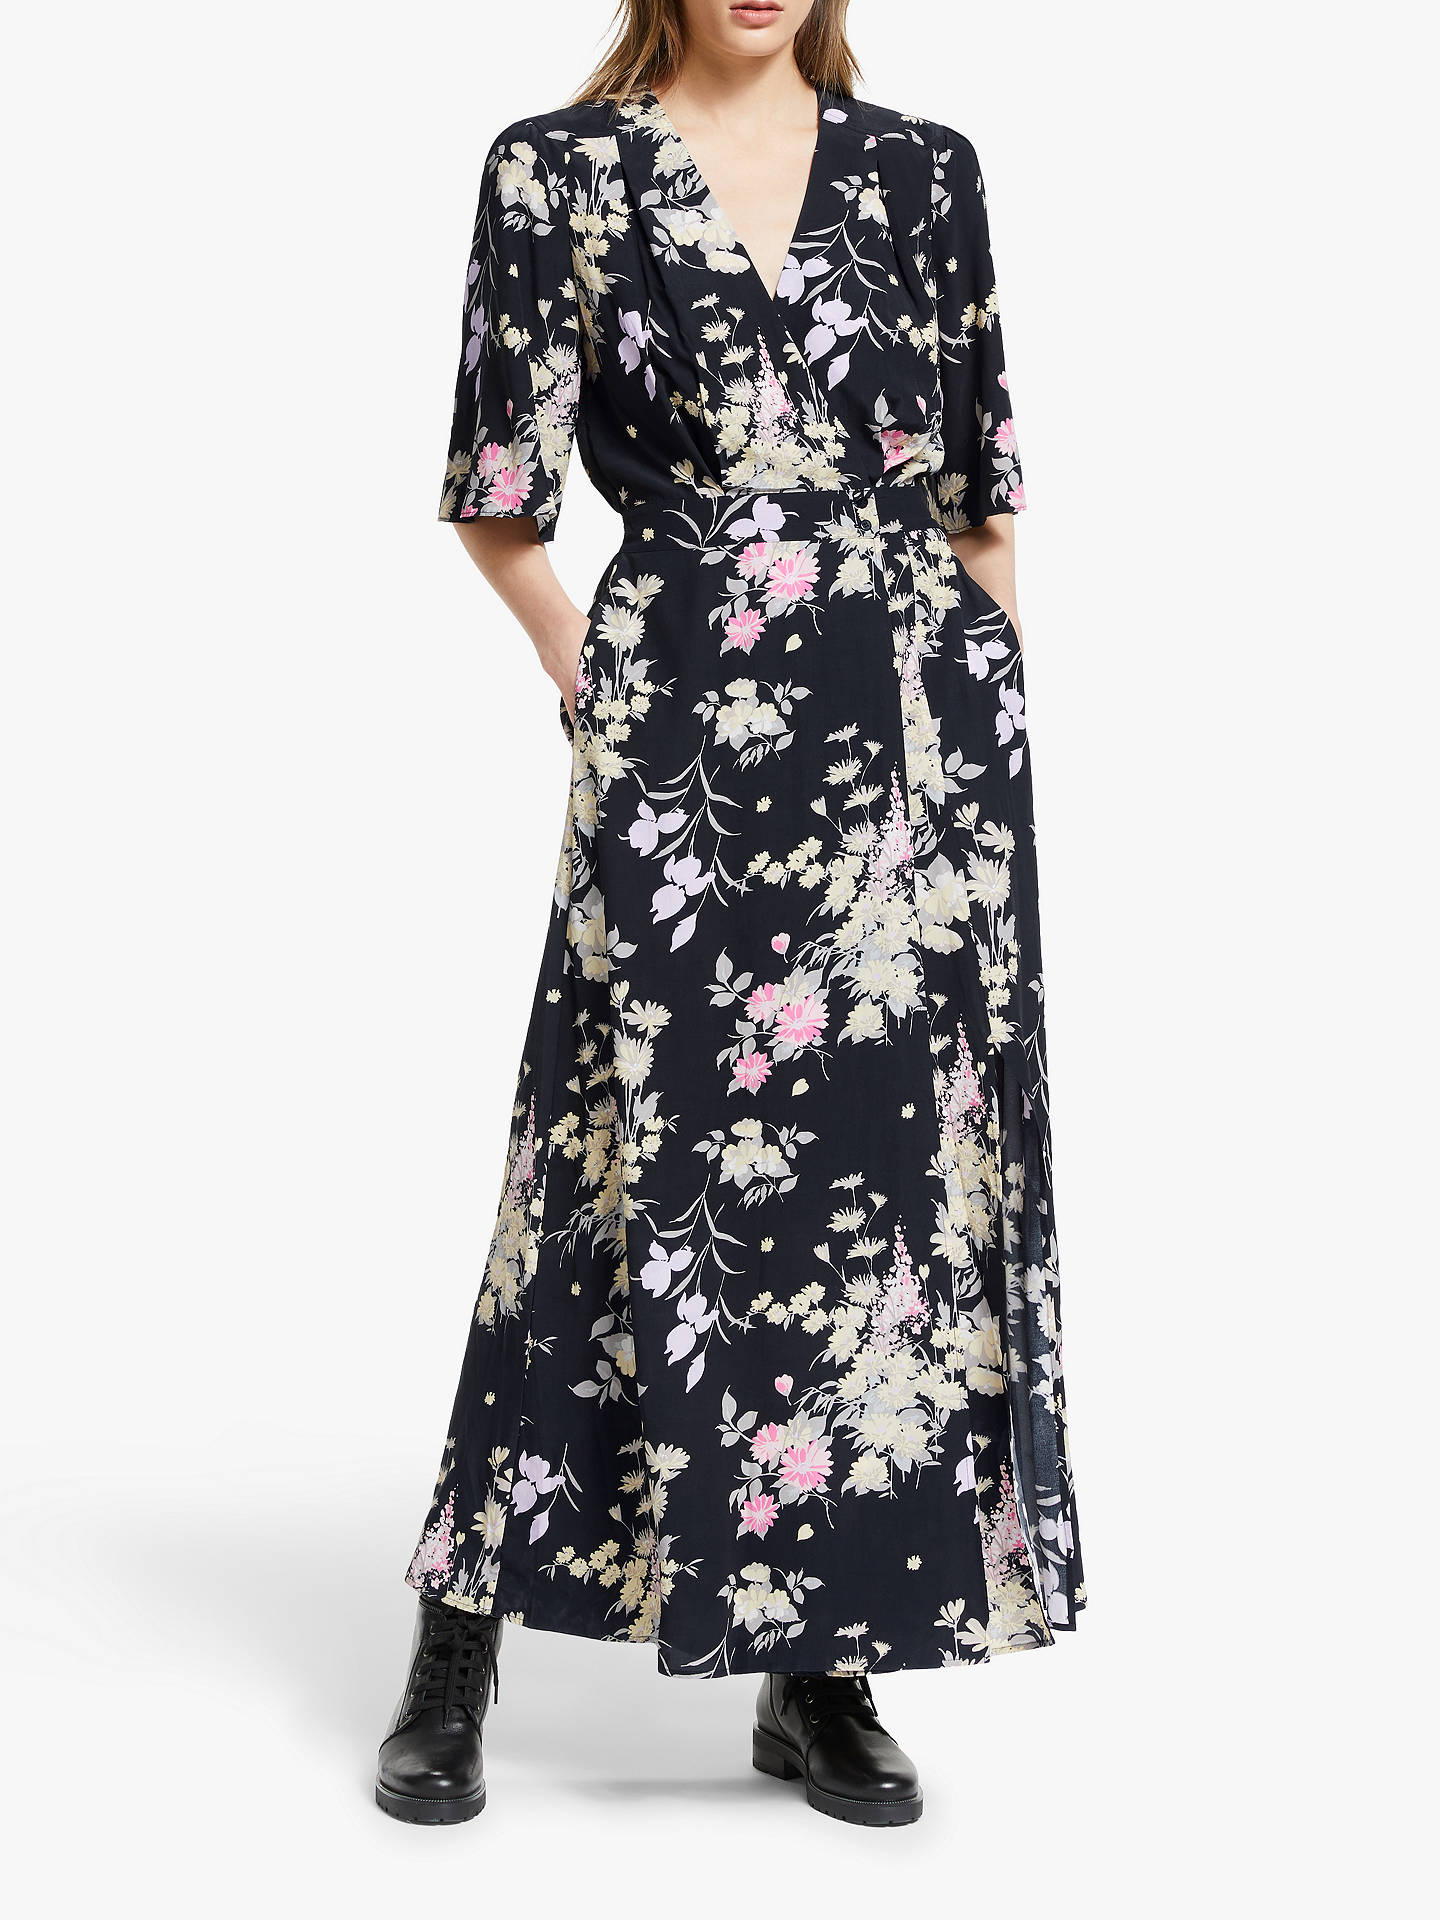 somerset-by-alice-temperley-garden-floral-wrap-dress,-multi by somerset-by-alice-temperley